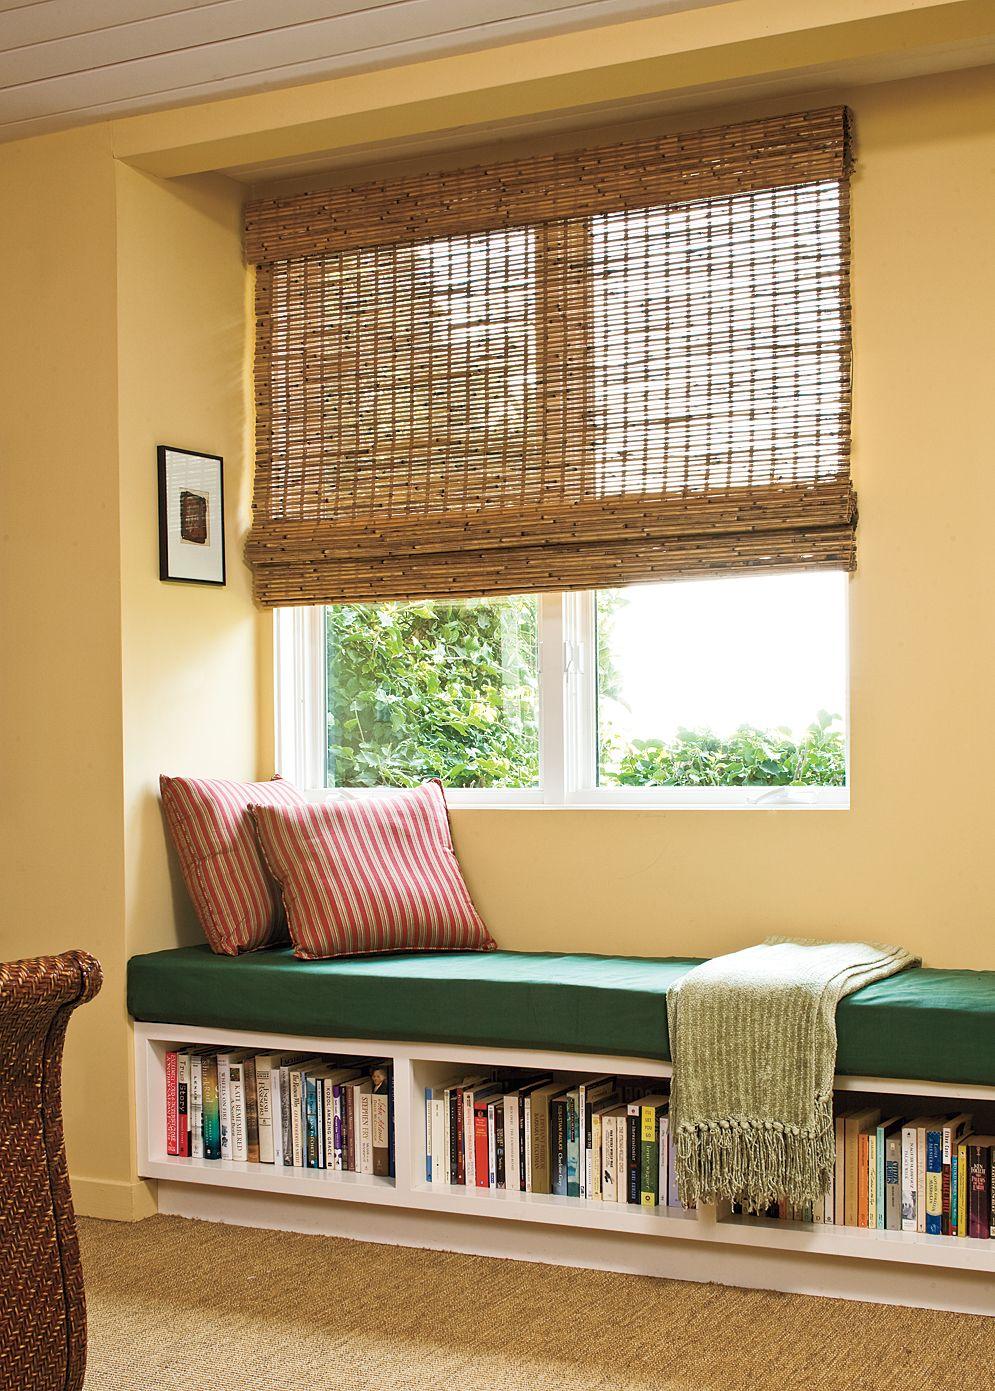 Sitting Pretty With Window Seats Window Seat Design Room Design Bedroom Bedroom Window Seat